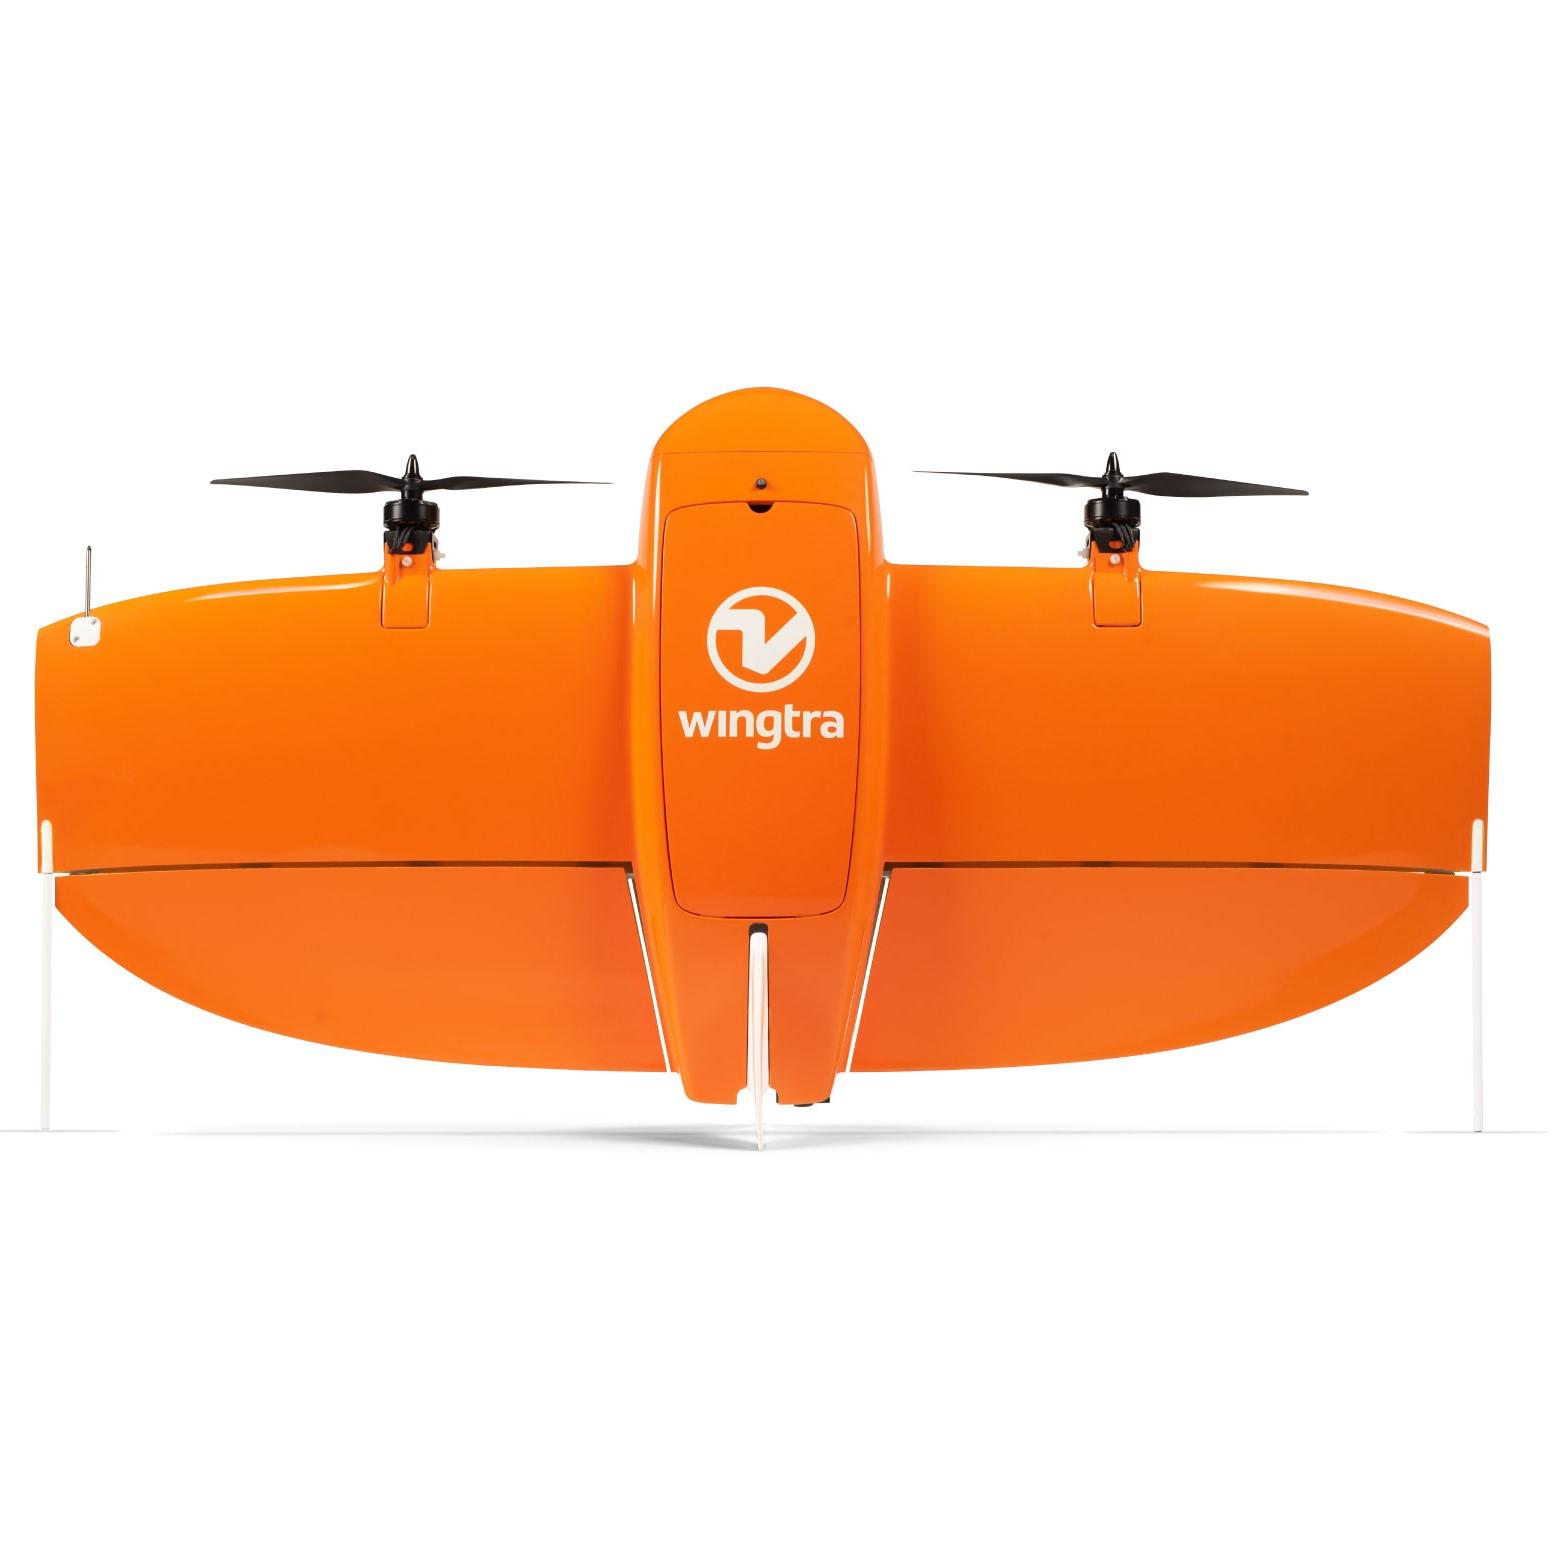 https://skaitech.al/wp-content/uploads/2021/08/2019-wingtra-drone-standing-front-1-1.jpg